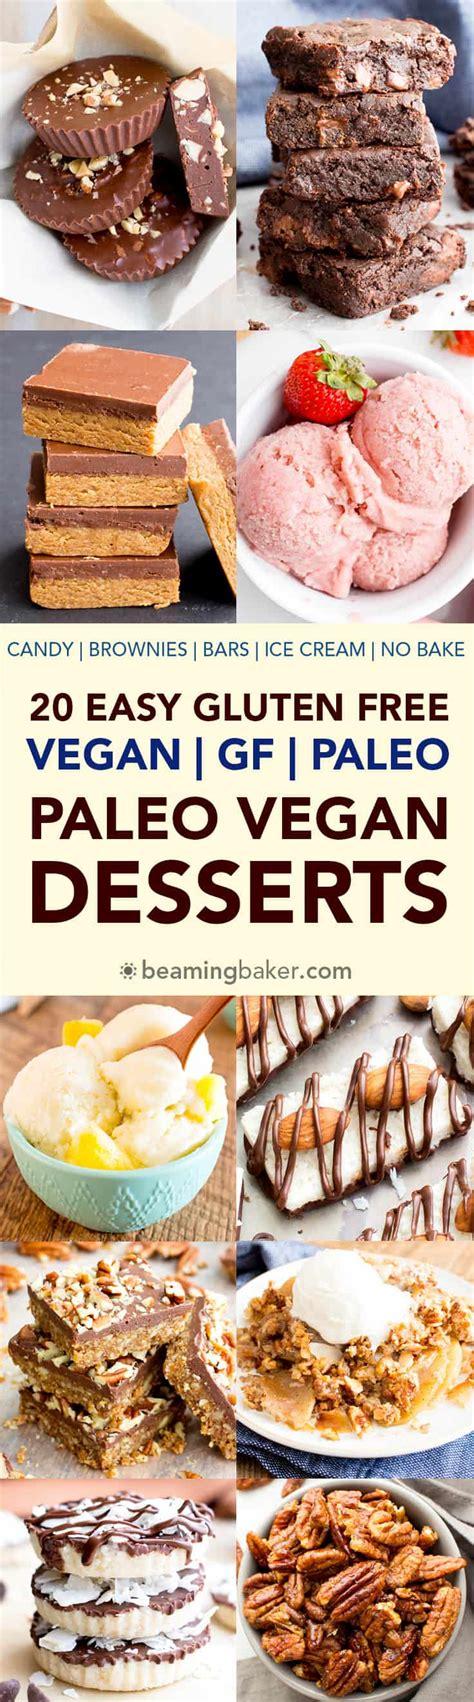 top vegan desserts recipes top 20 vegan paleo dessert recipes of 2017 v gf df beaming baker